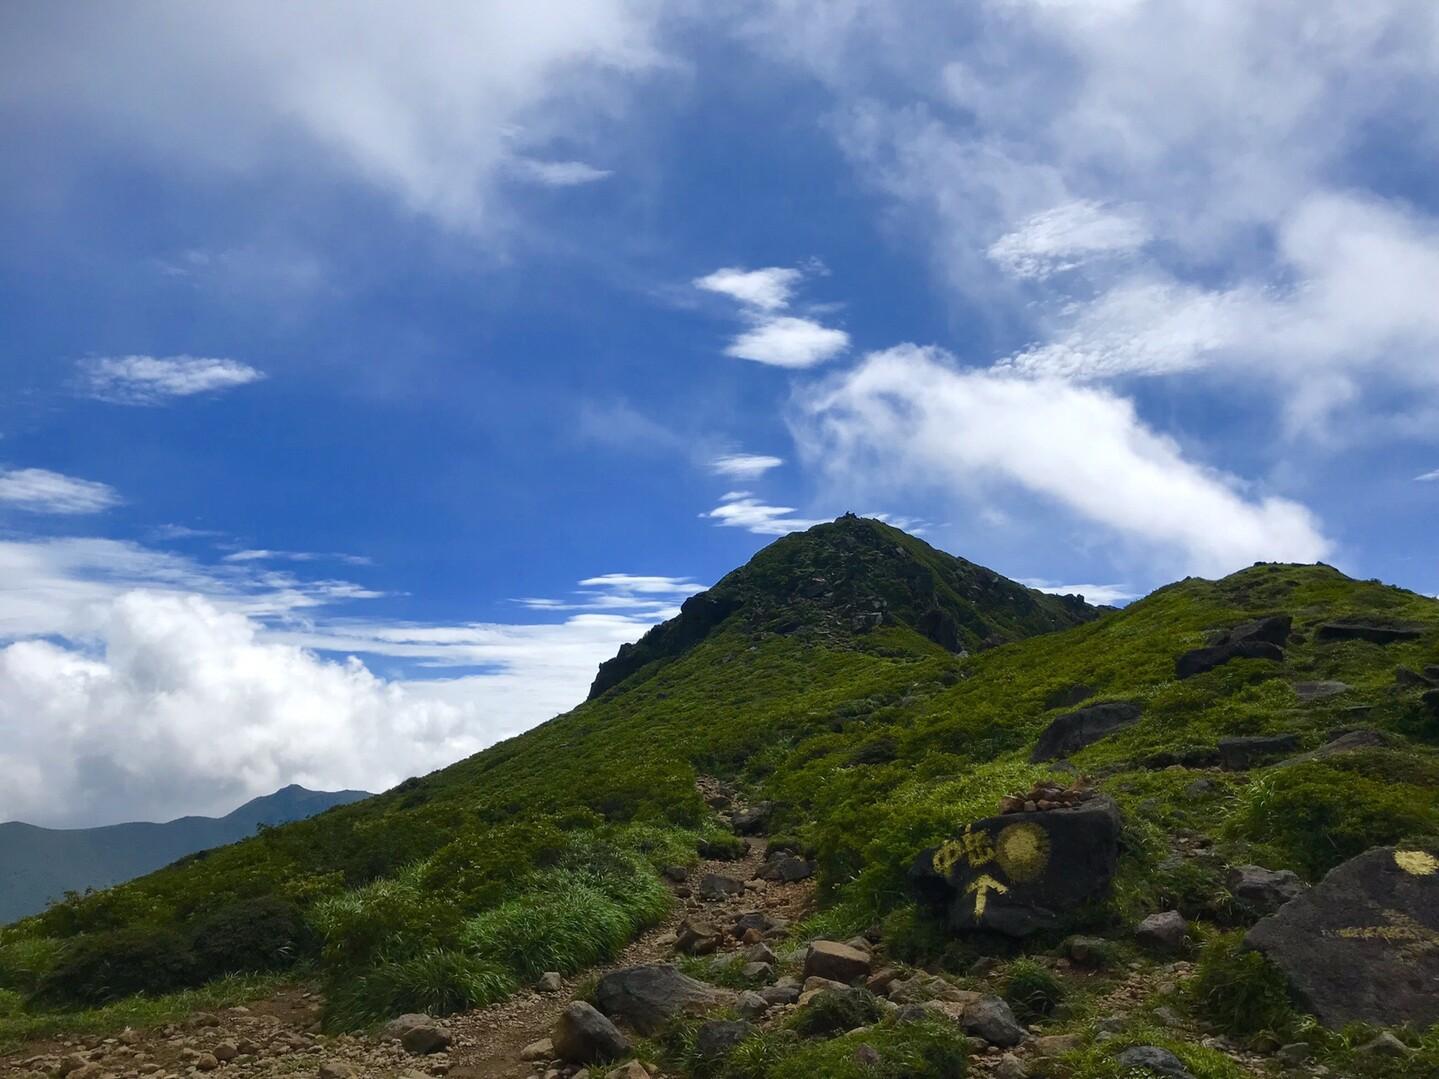 中岳(九重連山)の写真